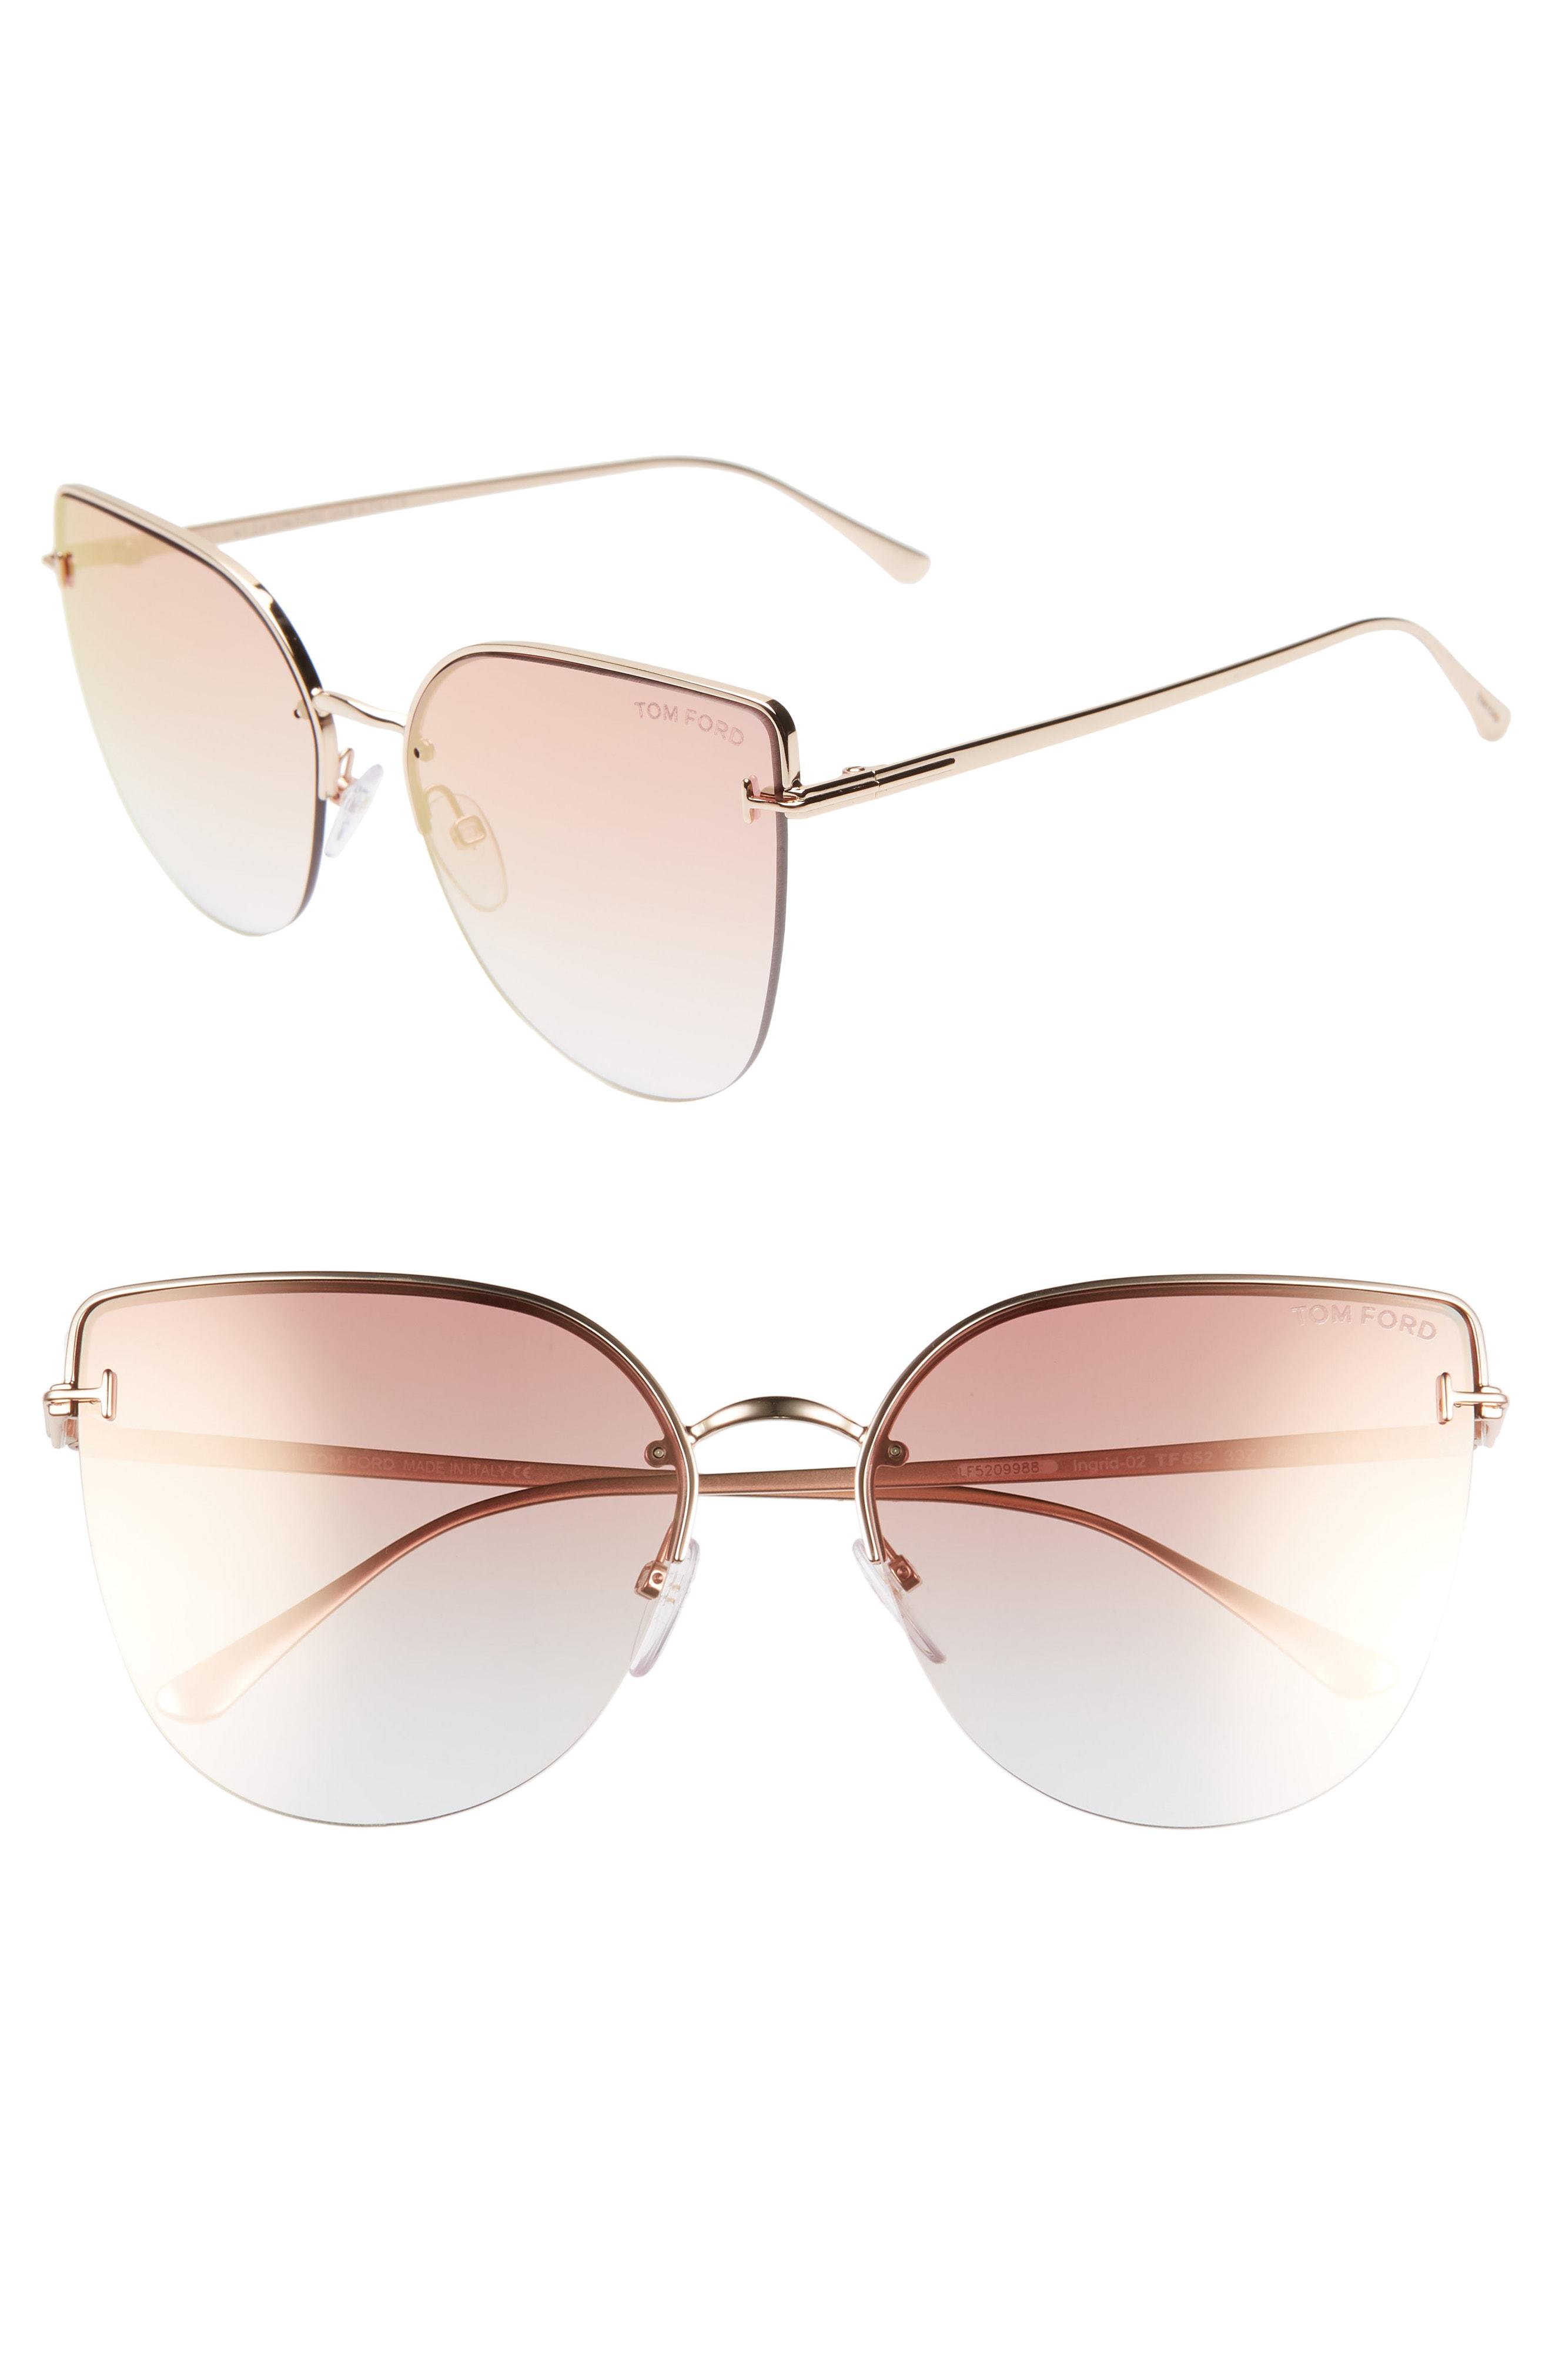 f931fa9c644d Tom Ford Ingrid 60Mm Cat Eye Sunglasses - Rose Gold  Pink W Red Mirror